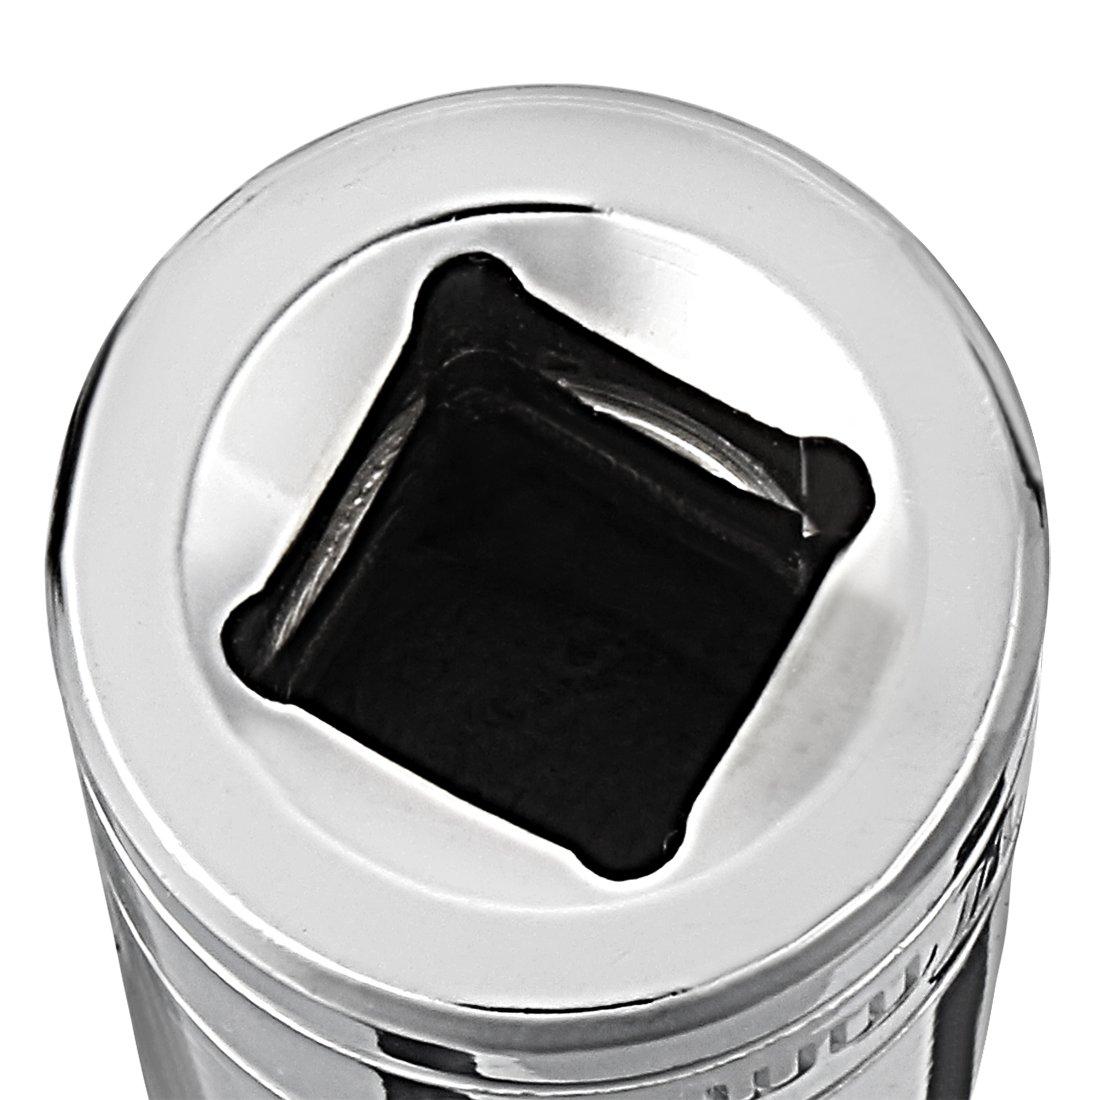 VictorsHome 1//4 Inch Drive 6 Point Shallow Socket 10mm Metric Cr-V 4 Pack